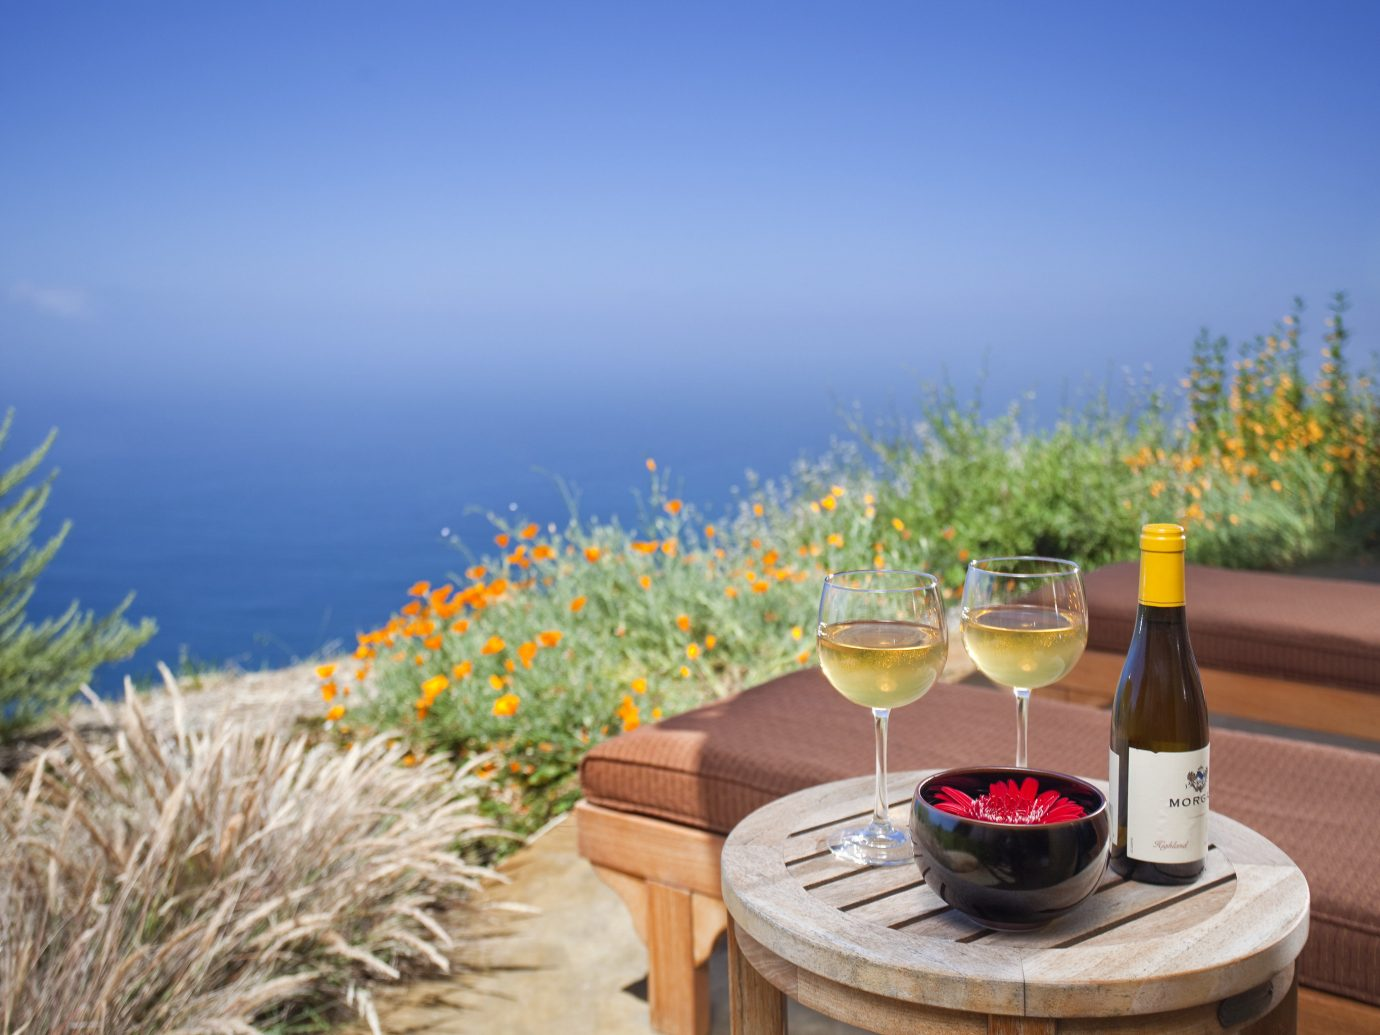 Hotels Romance Trip Ideas outdoor vacation estate flower plant